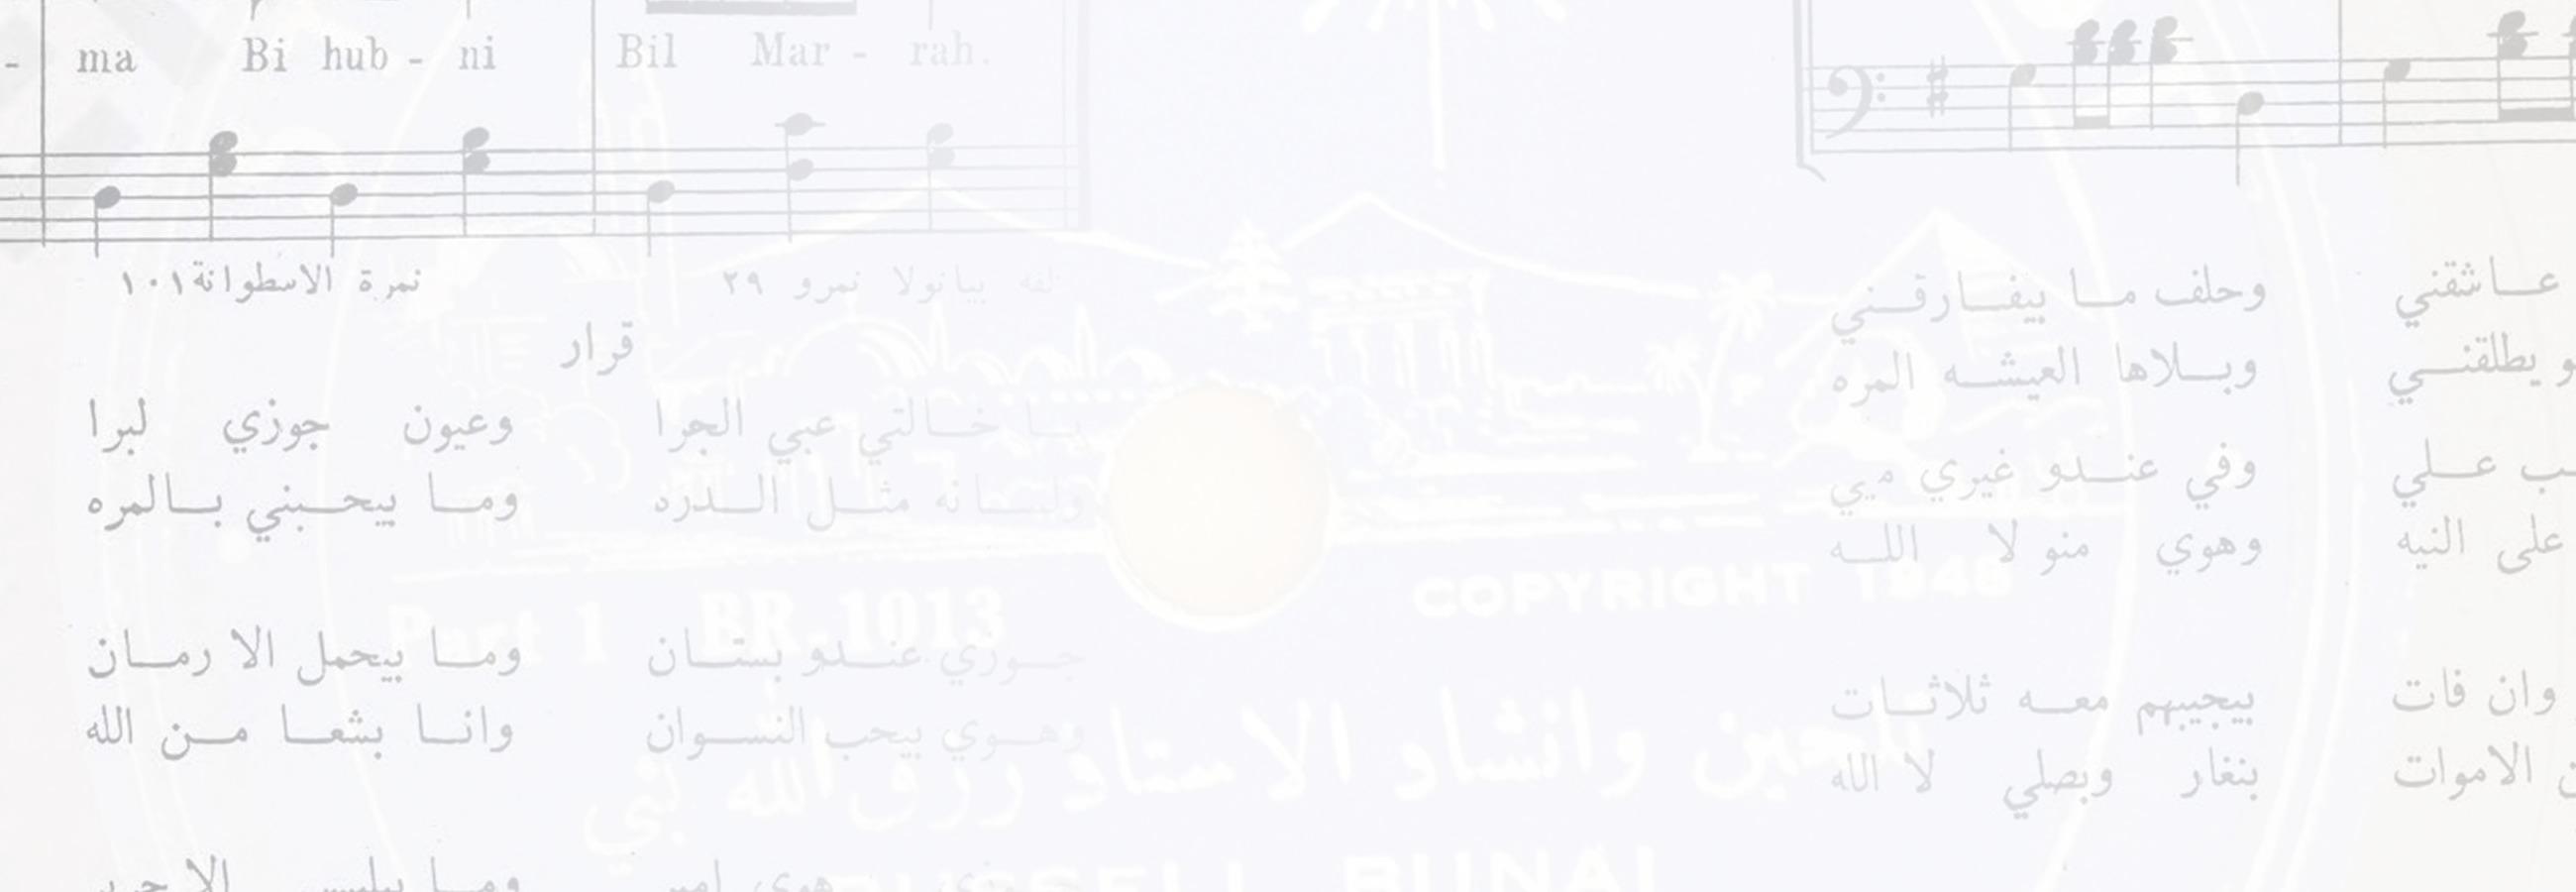 Sheet music from Arab American composer Alexander Maloof